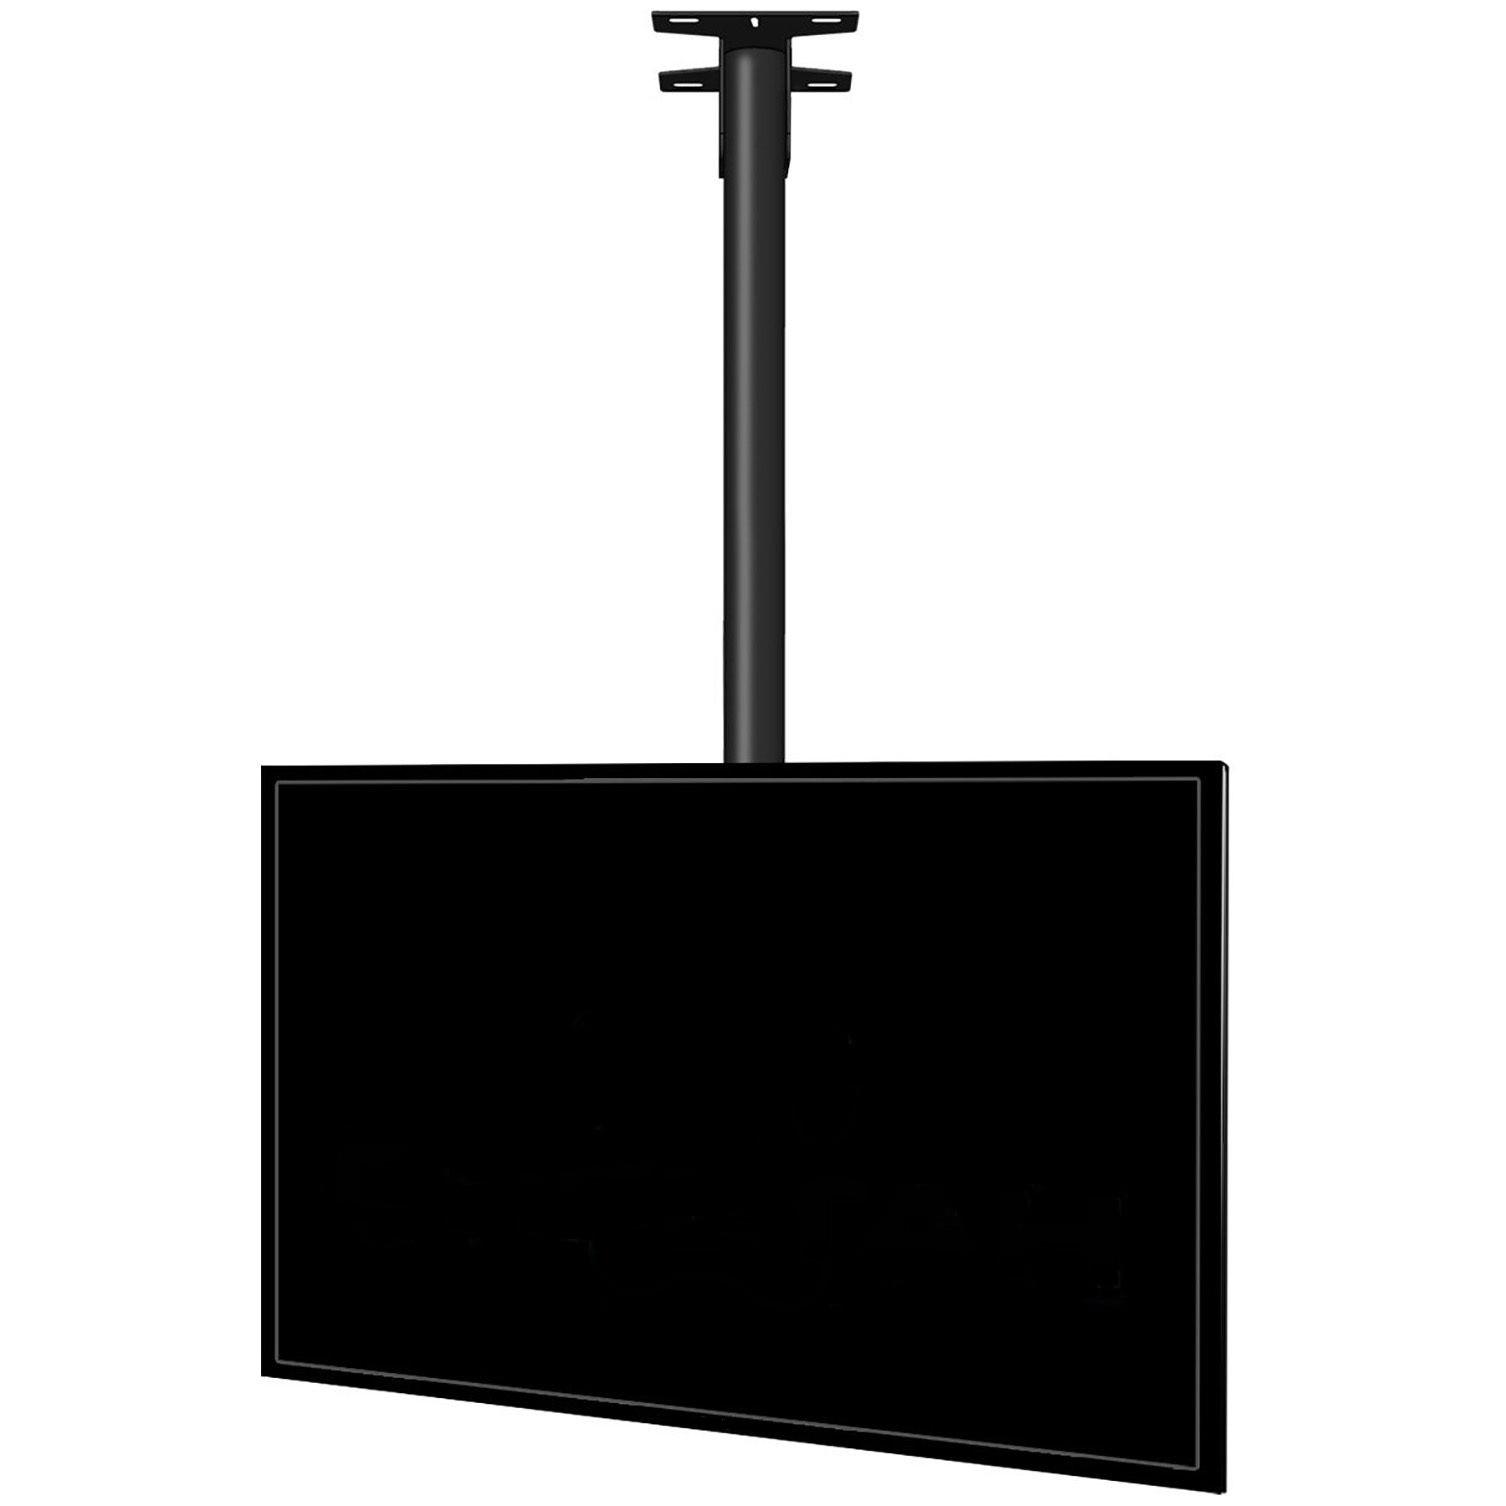 plasma rotate tv photo p monitor to mounts ceiling customer bracket degrees mount fits